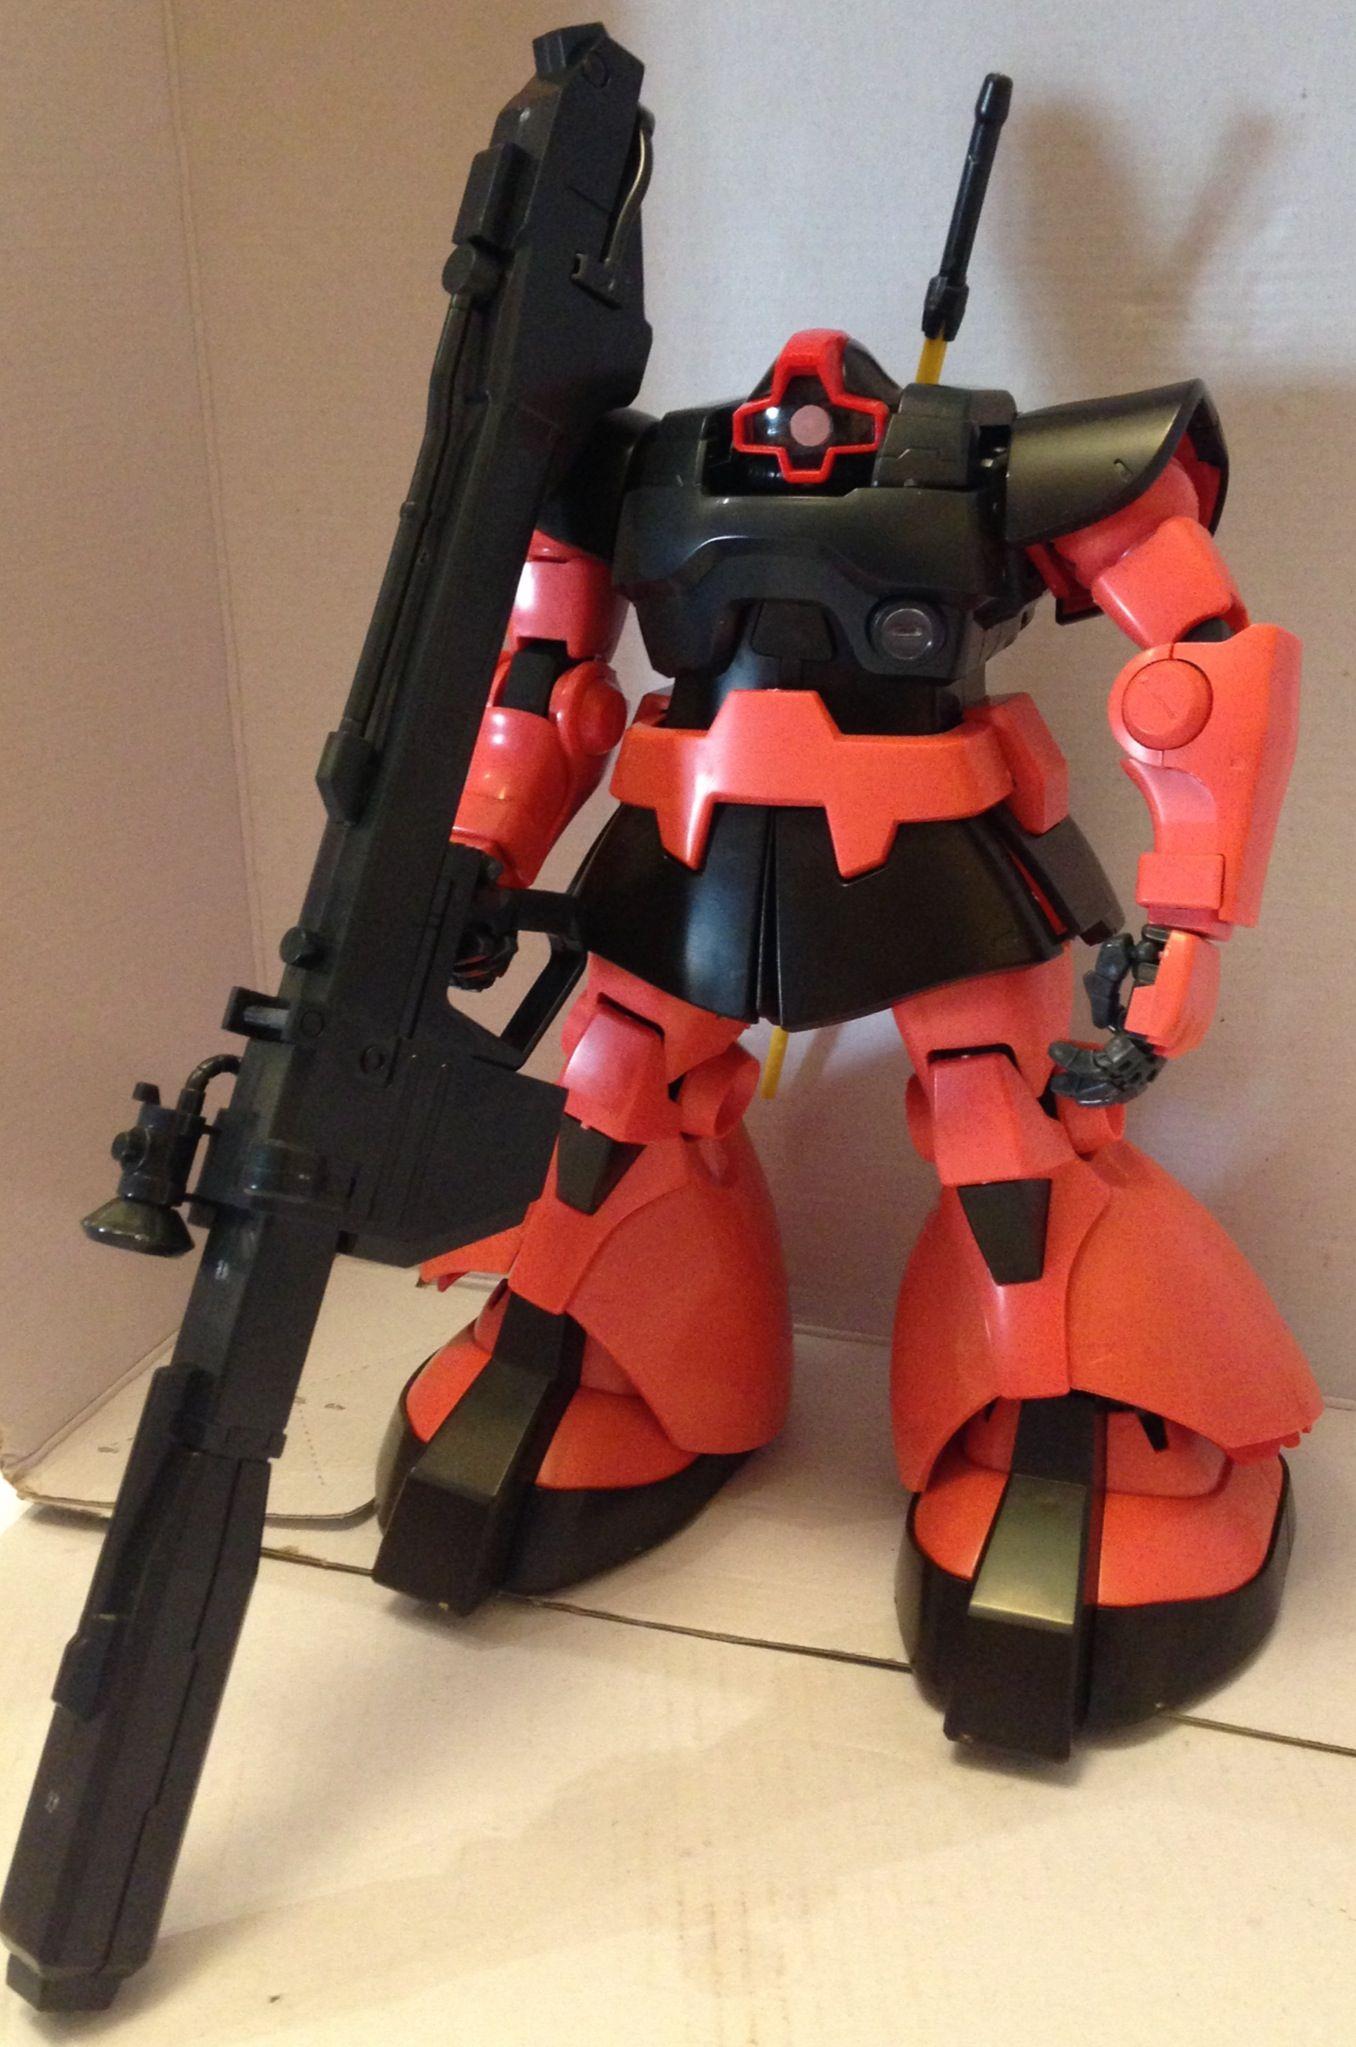 Daban Model - 6608 Rick-Dom - Armed 1